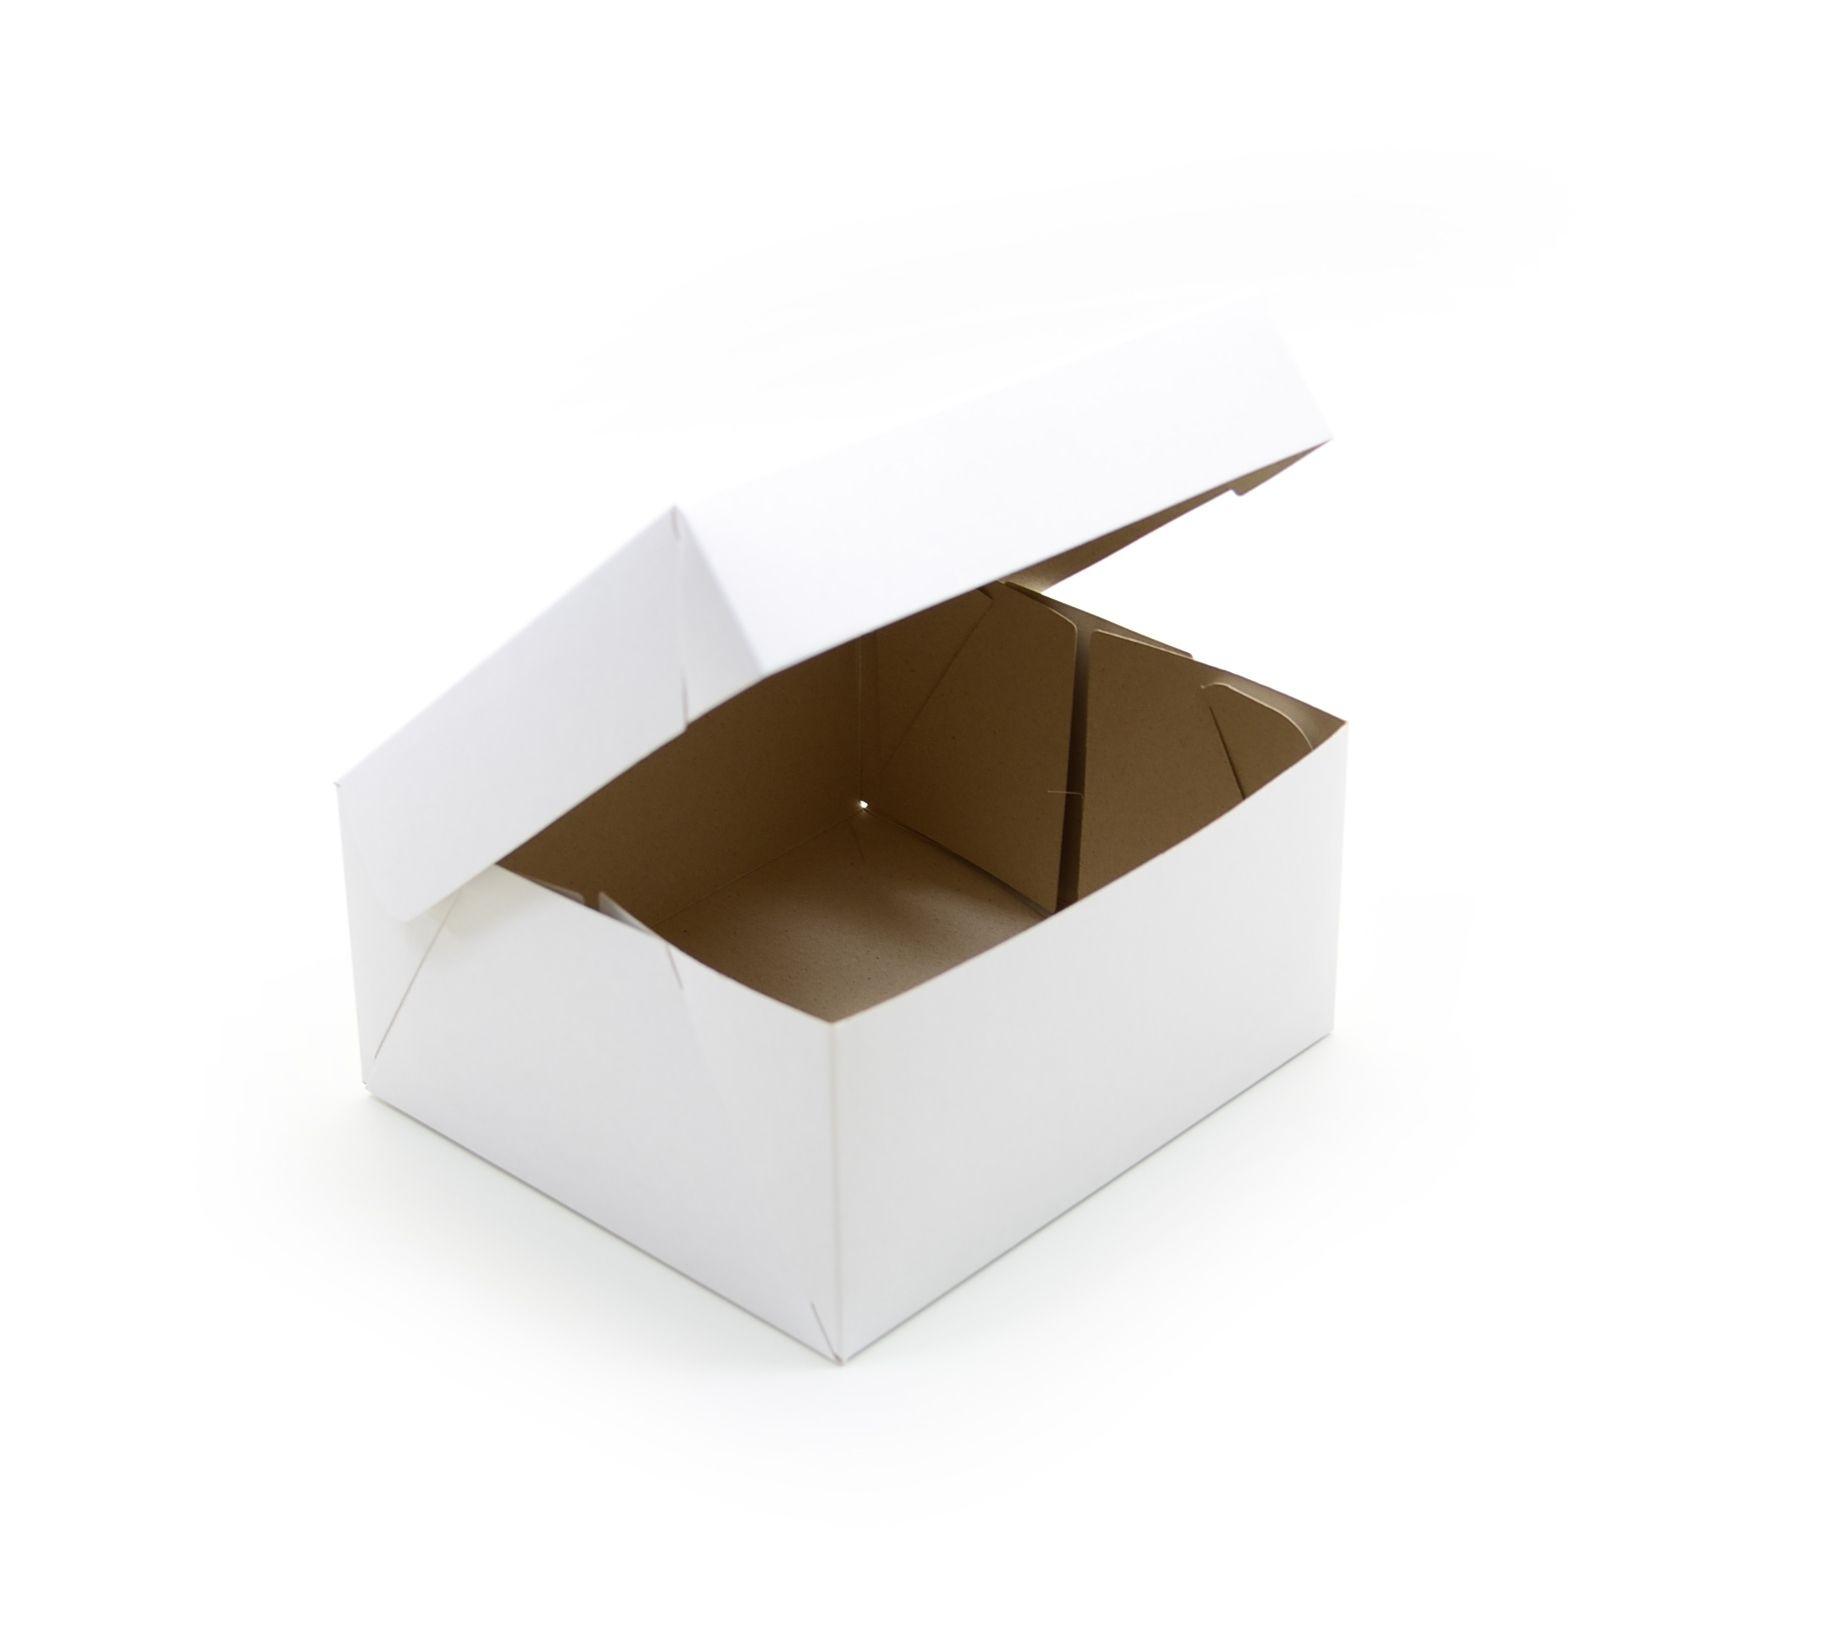 Ref 079 Branca - Caixa Baú - 18,5x16,5x9 cm - c/ 10 unidades